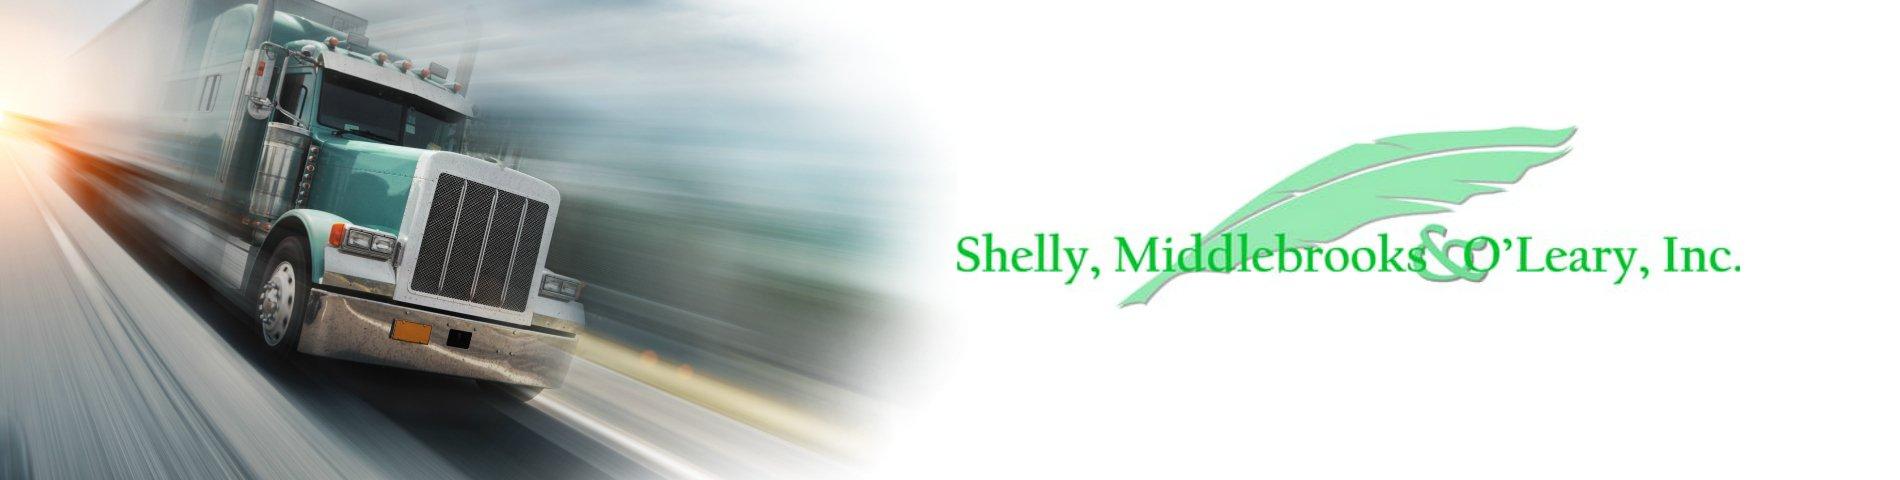 Shelly Middlebrooks Insurance